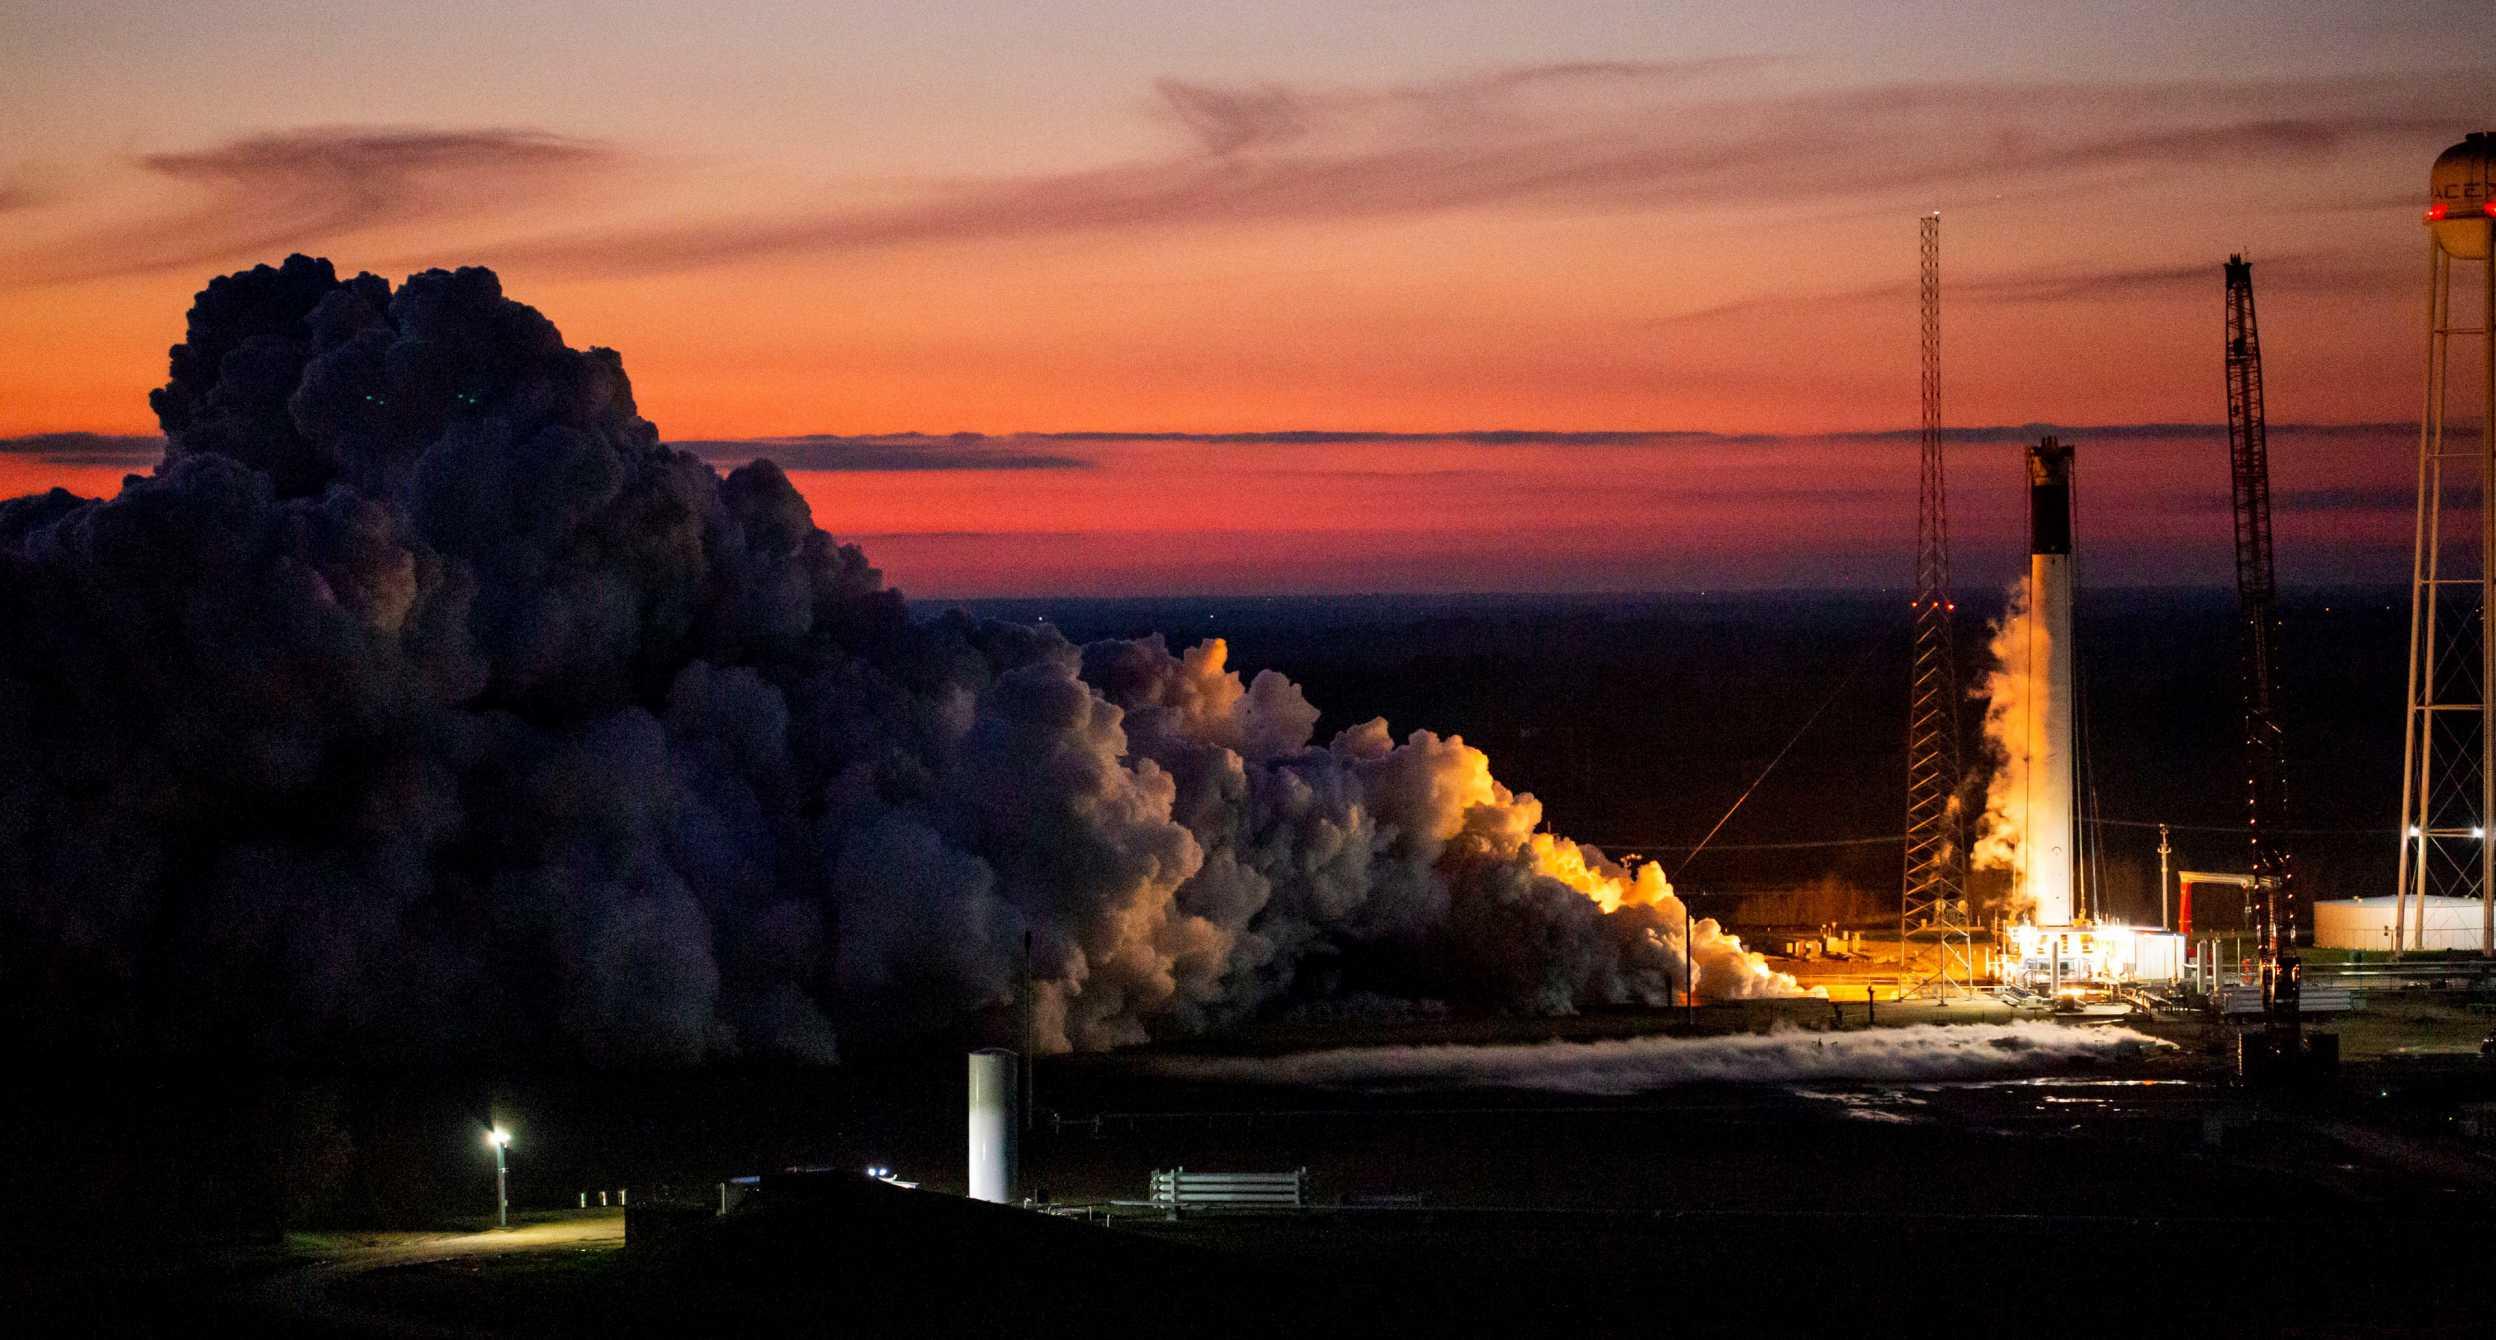 Falcon 9 B106x GPS III SV03 McGregor static fire 021320 (SpaceX) 1 crop (c)